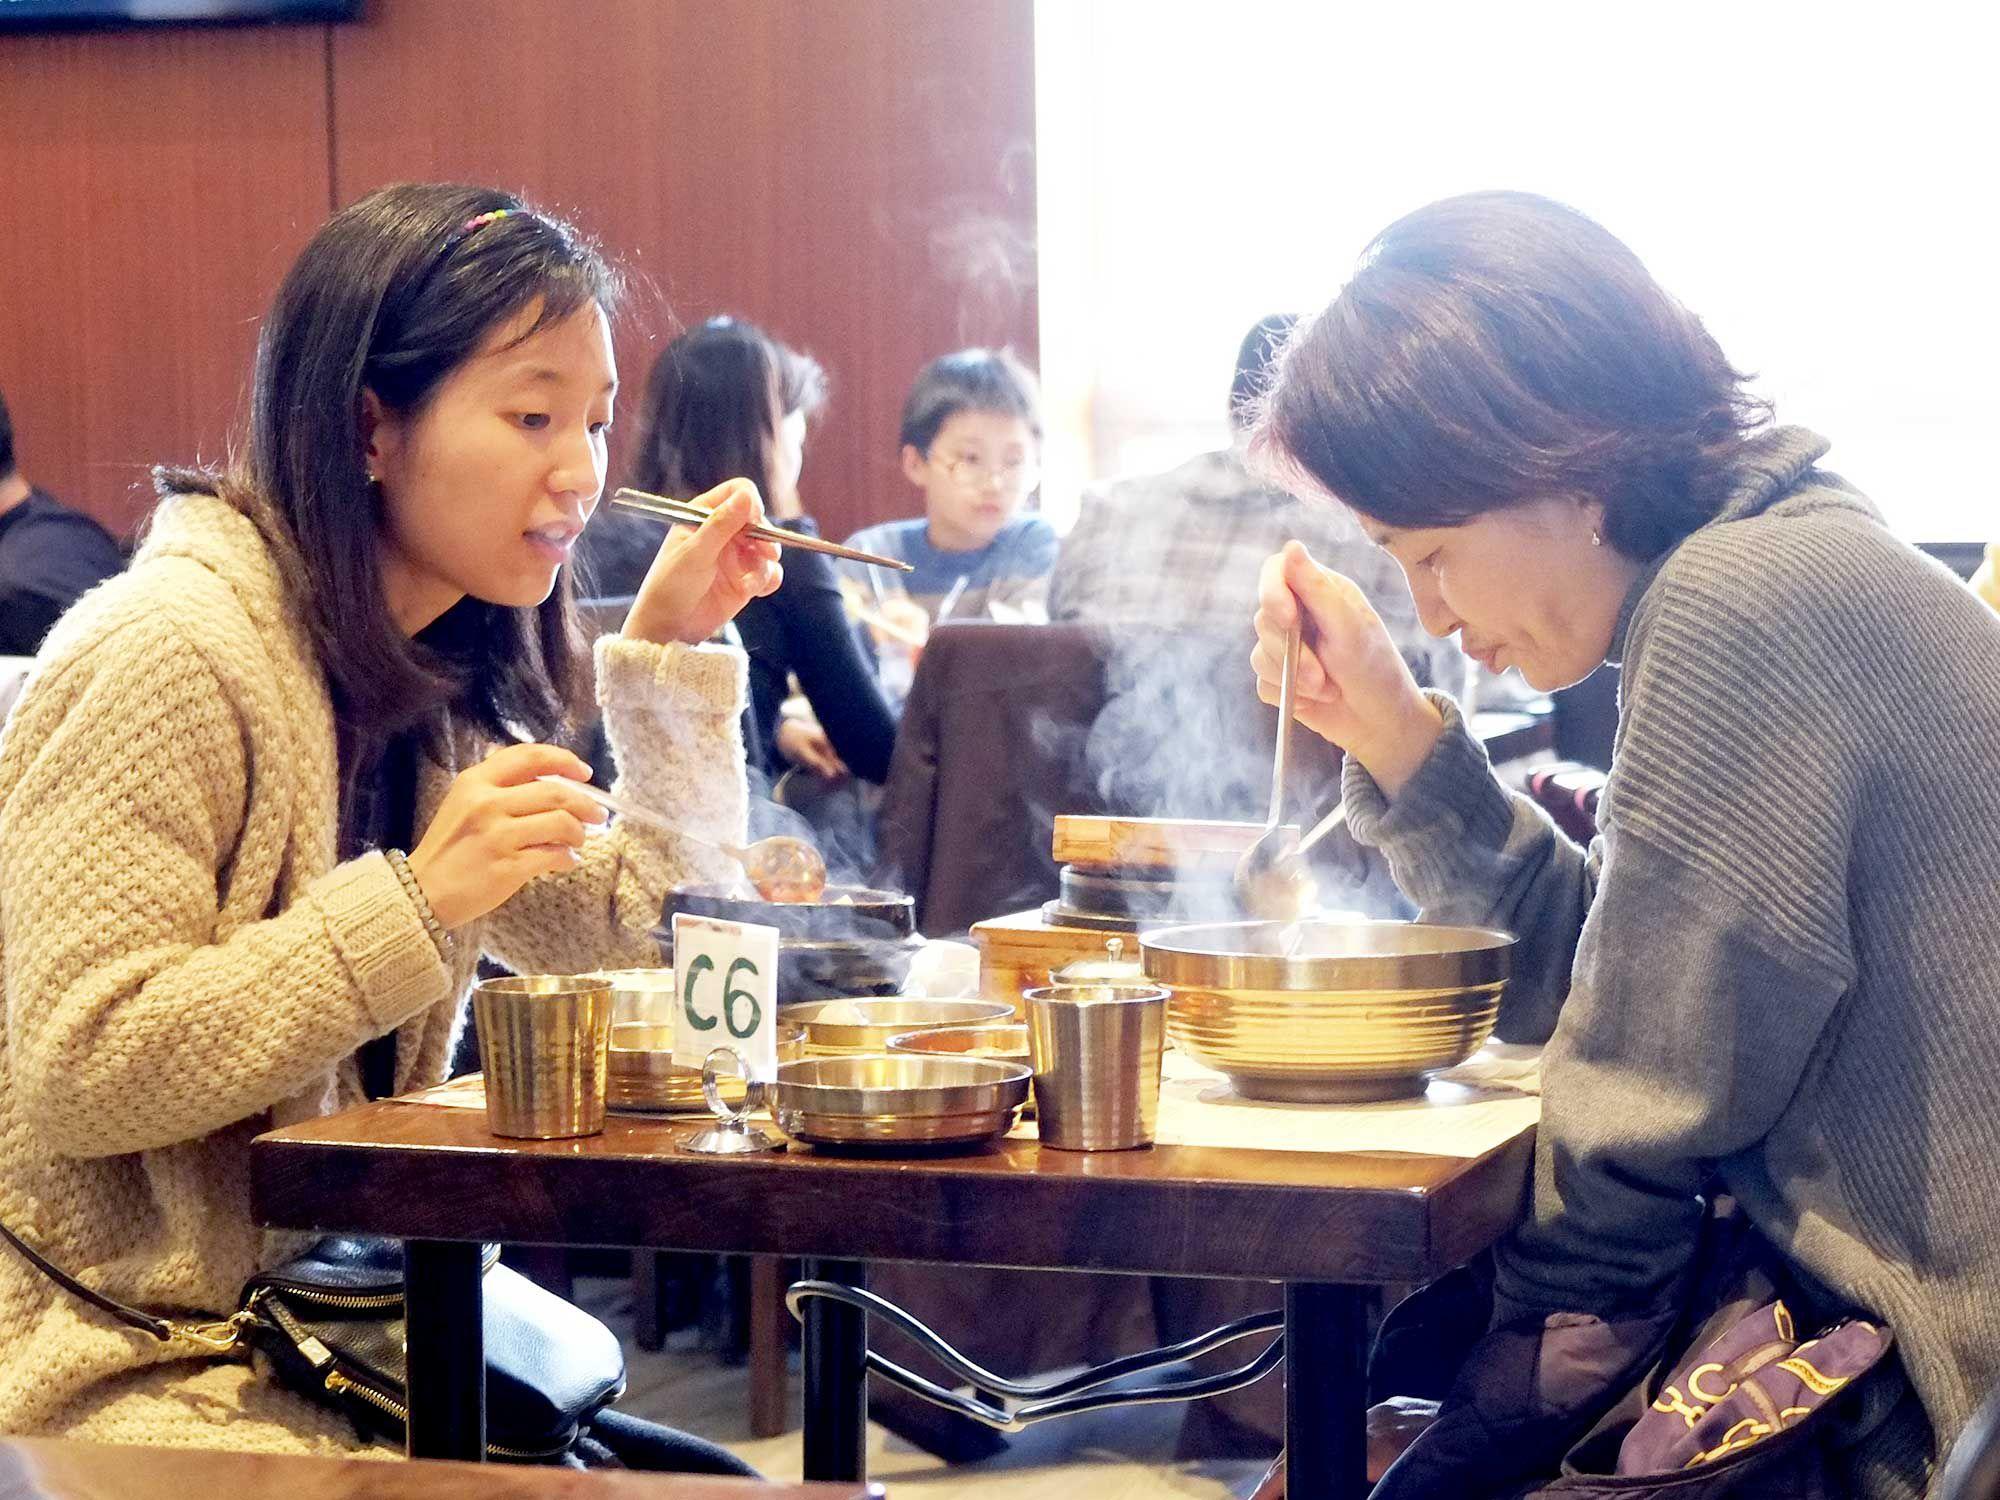 Korean Food In Fort Lee New Jersey